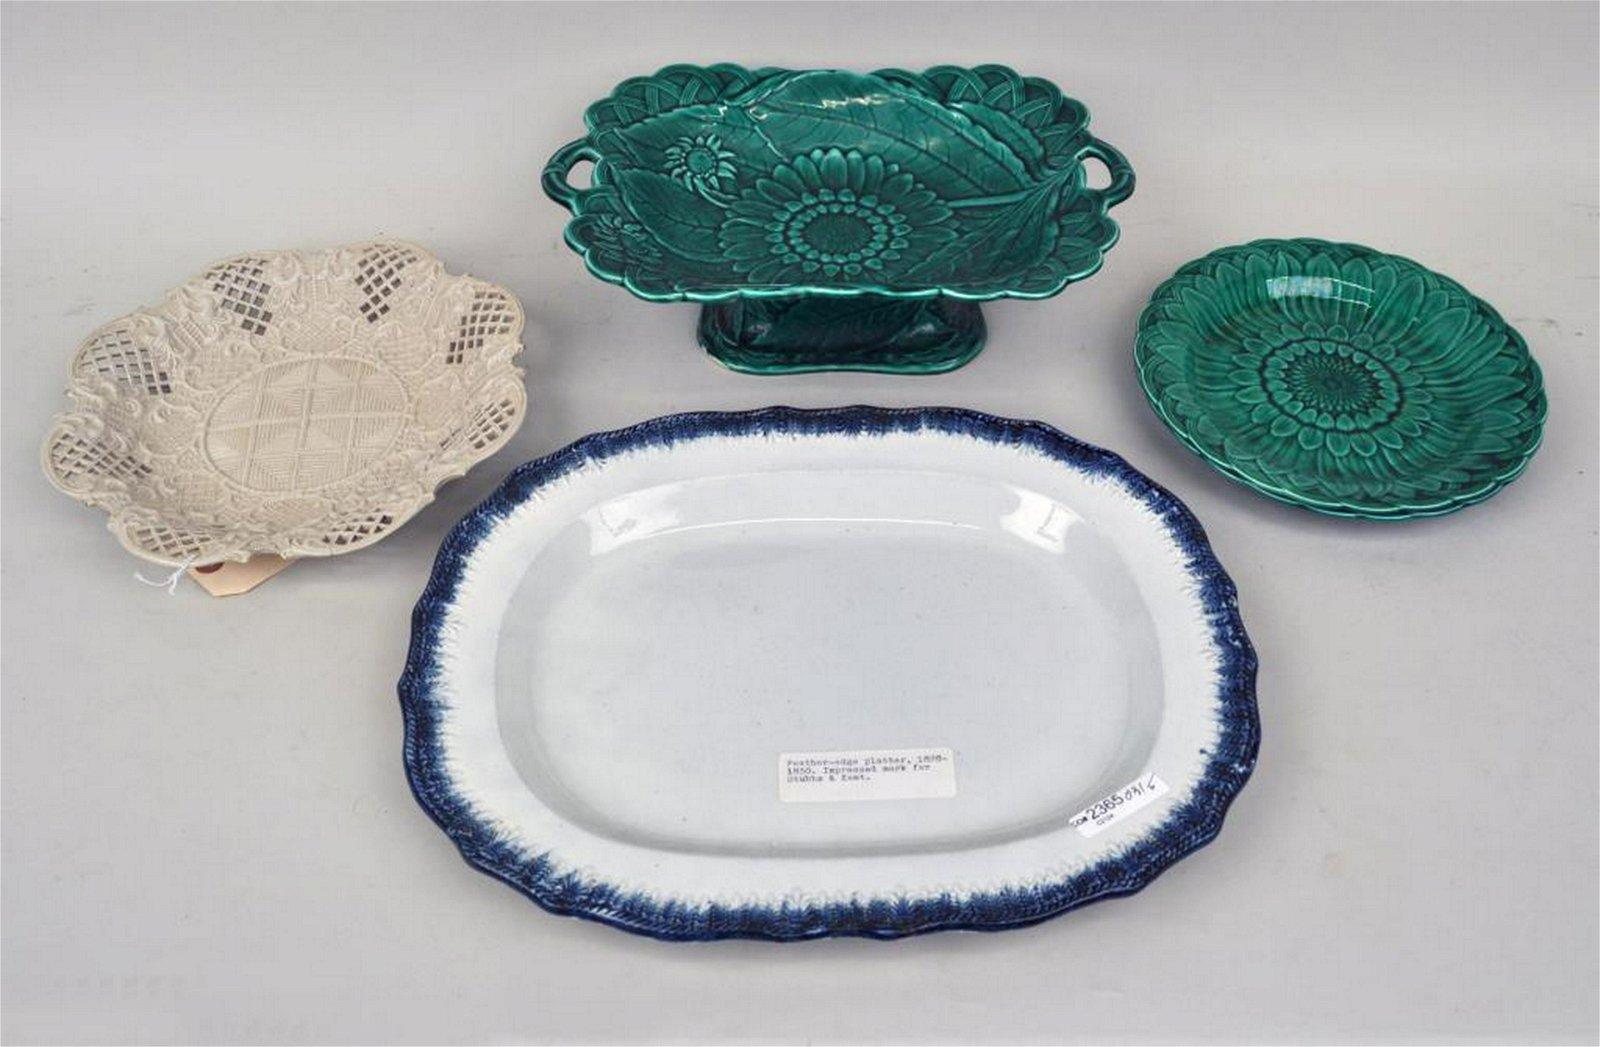 Estate Group English Porcelain/Pottery Wares